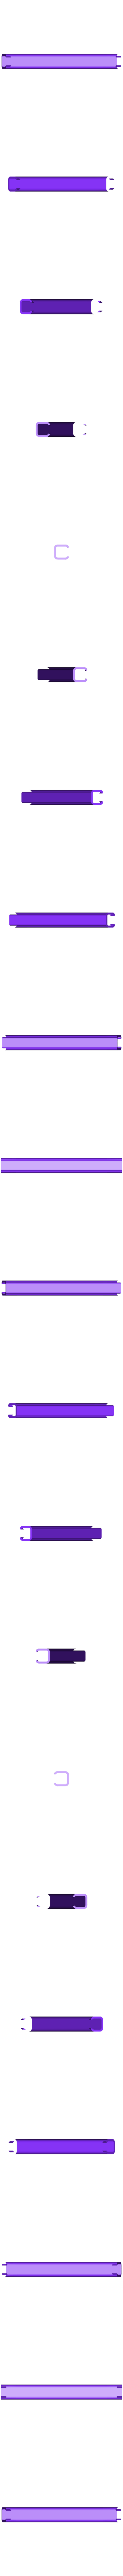 boomypi-handle-grip.stl Download free STL file Raspberry Pi Airplay BoomBox • 3D printer template, Adafruit